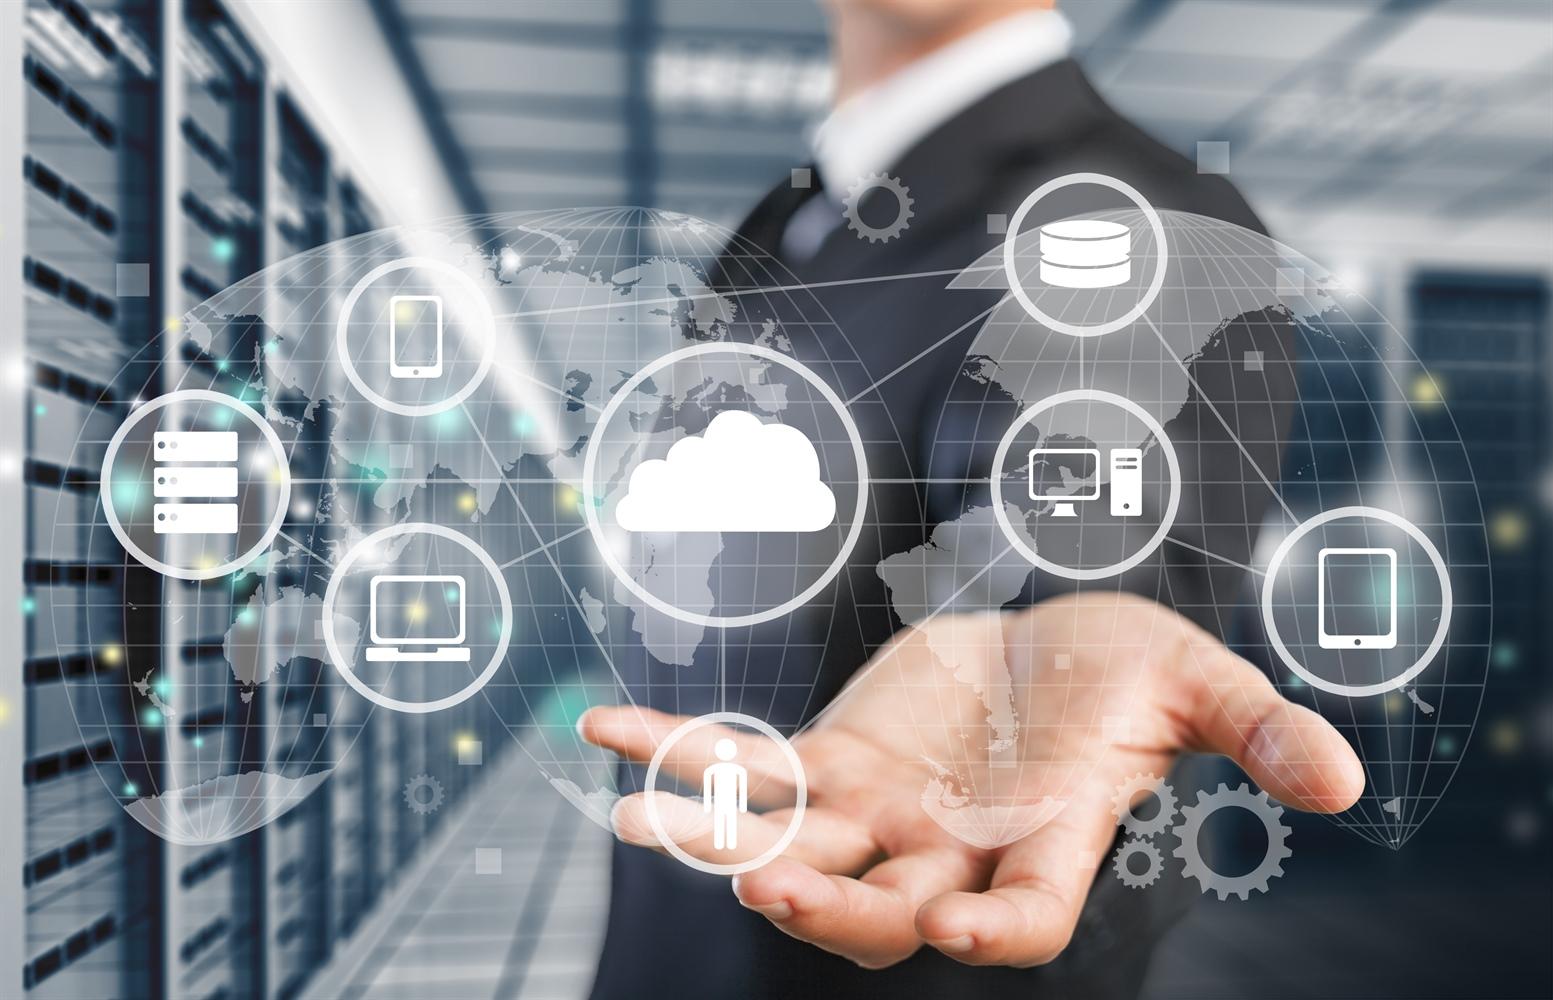 Cloud Storage – Safe or not?